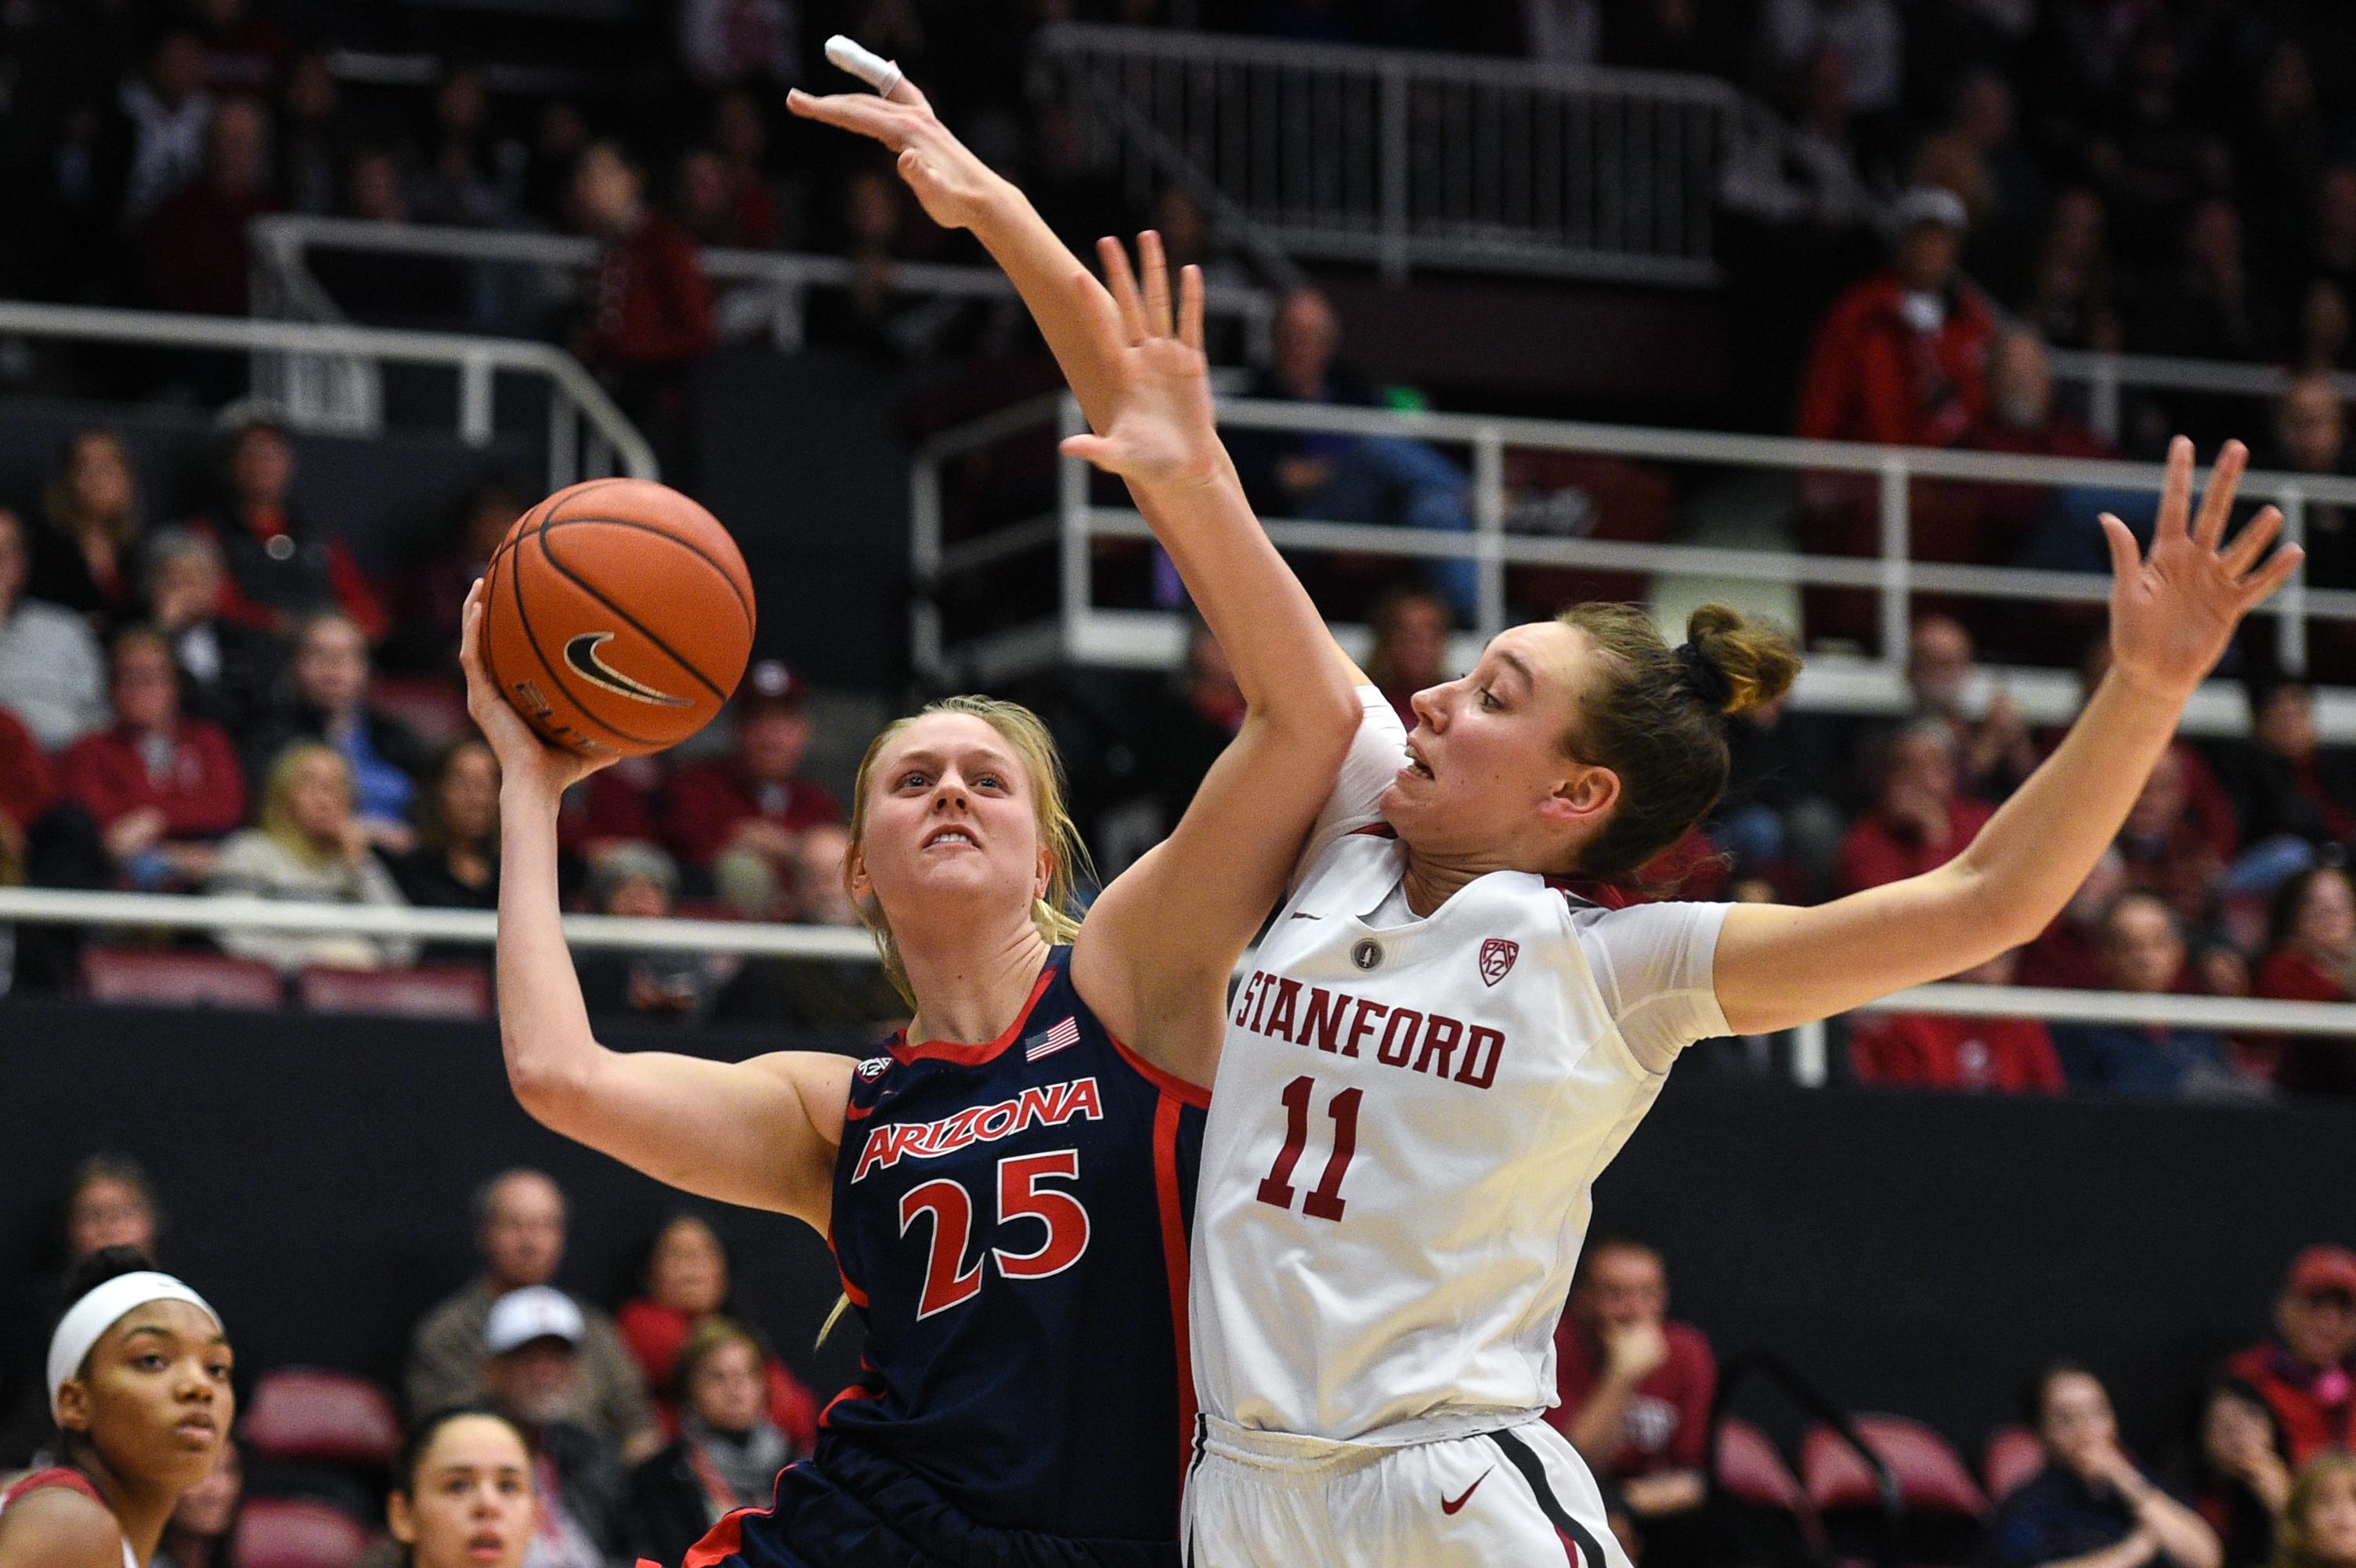 COLLEGE BASKETBALL: FEB 22 Women's Arizona at Stanford